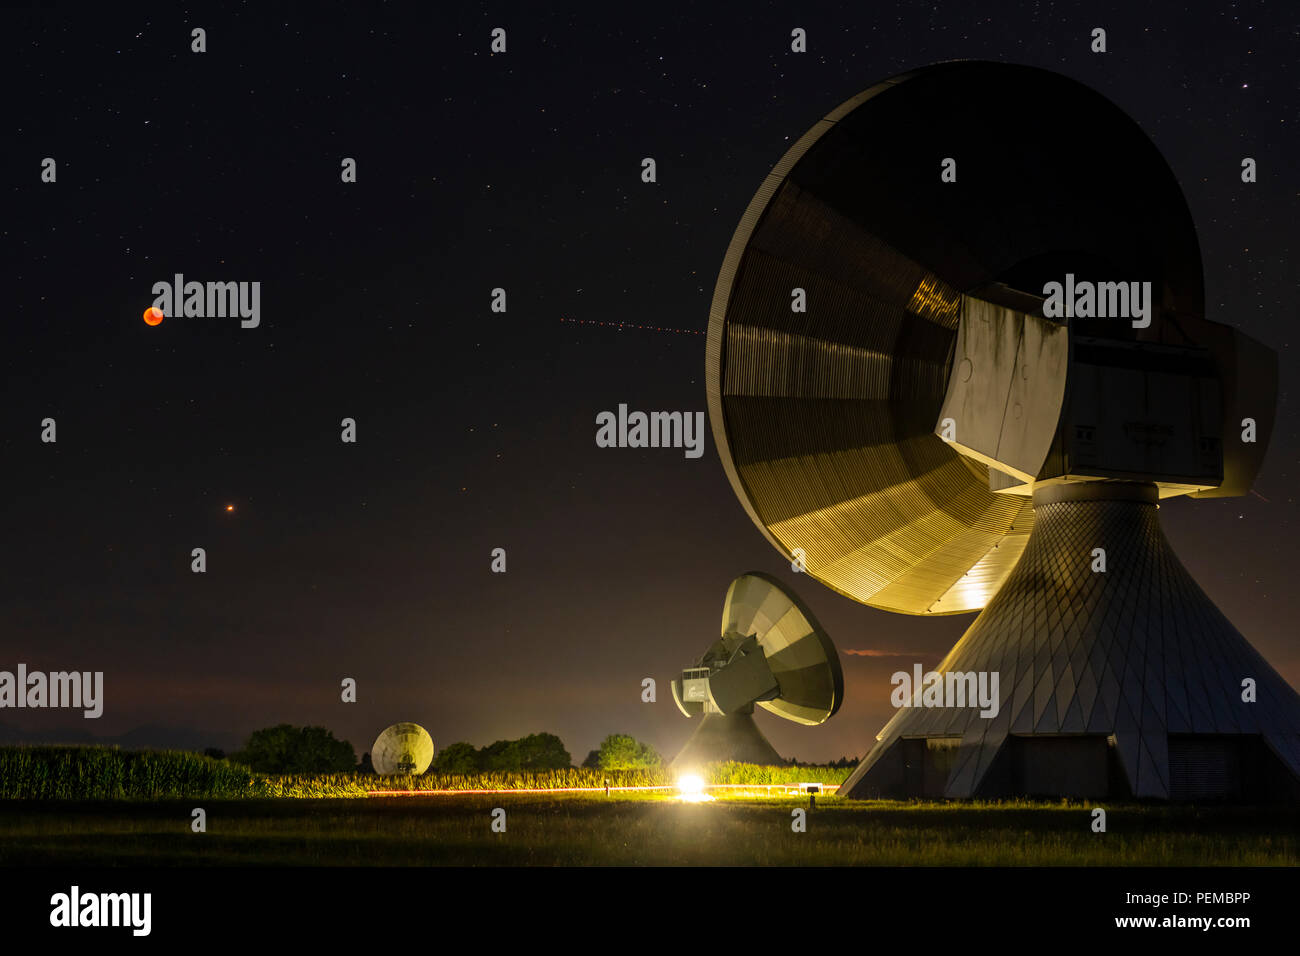 Parabolic antennas with blood moon at lunar eclipse, night shot, Raisting, Upper Bavaria, Germany - Stock Image